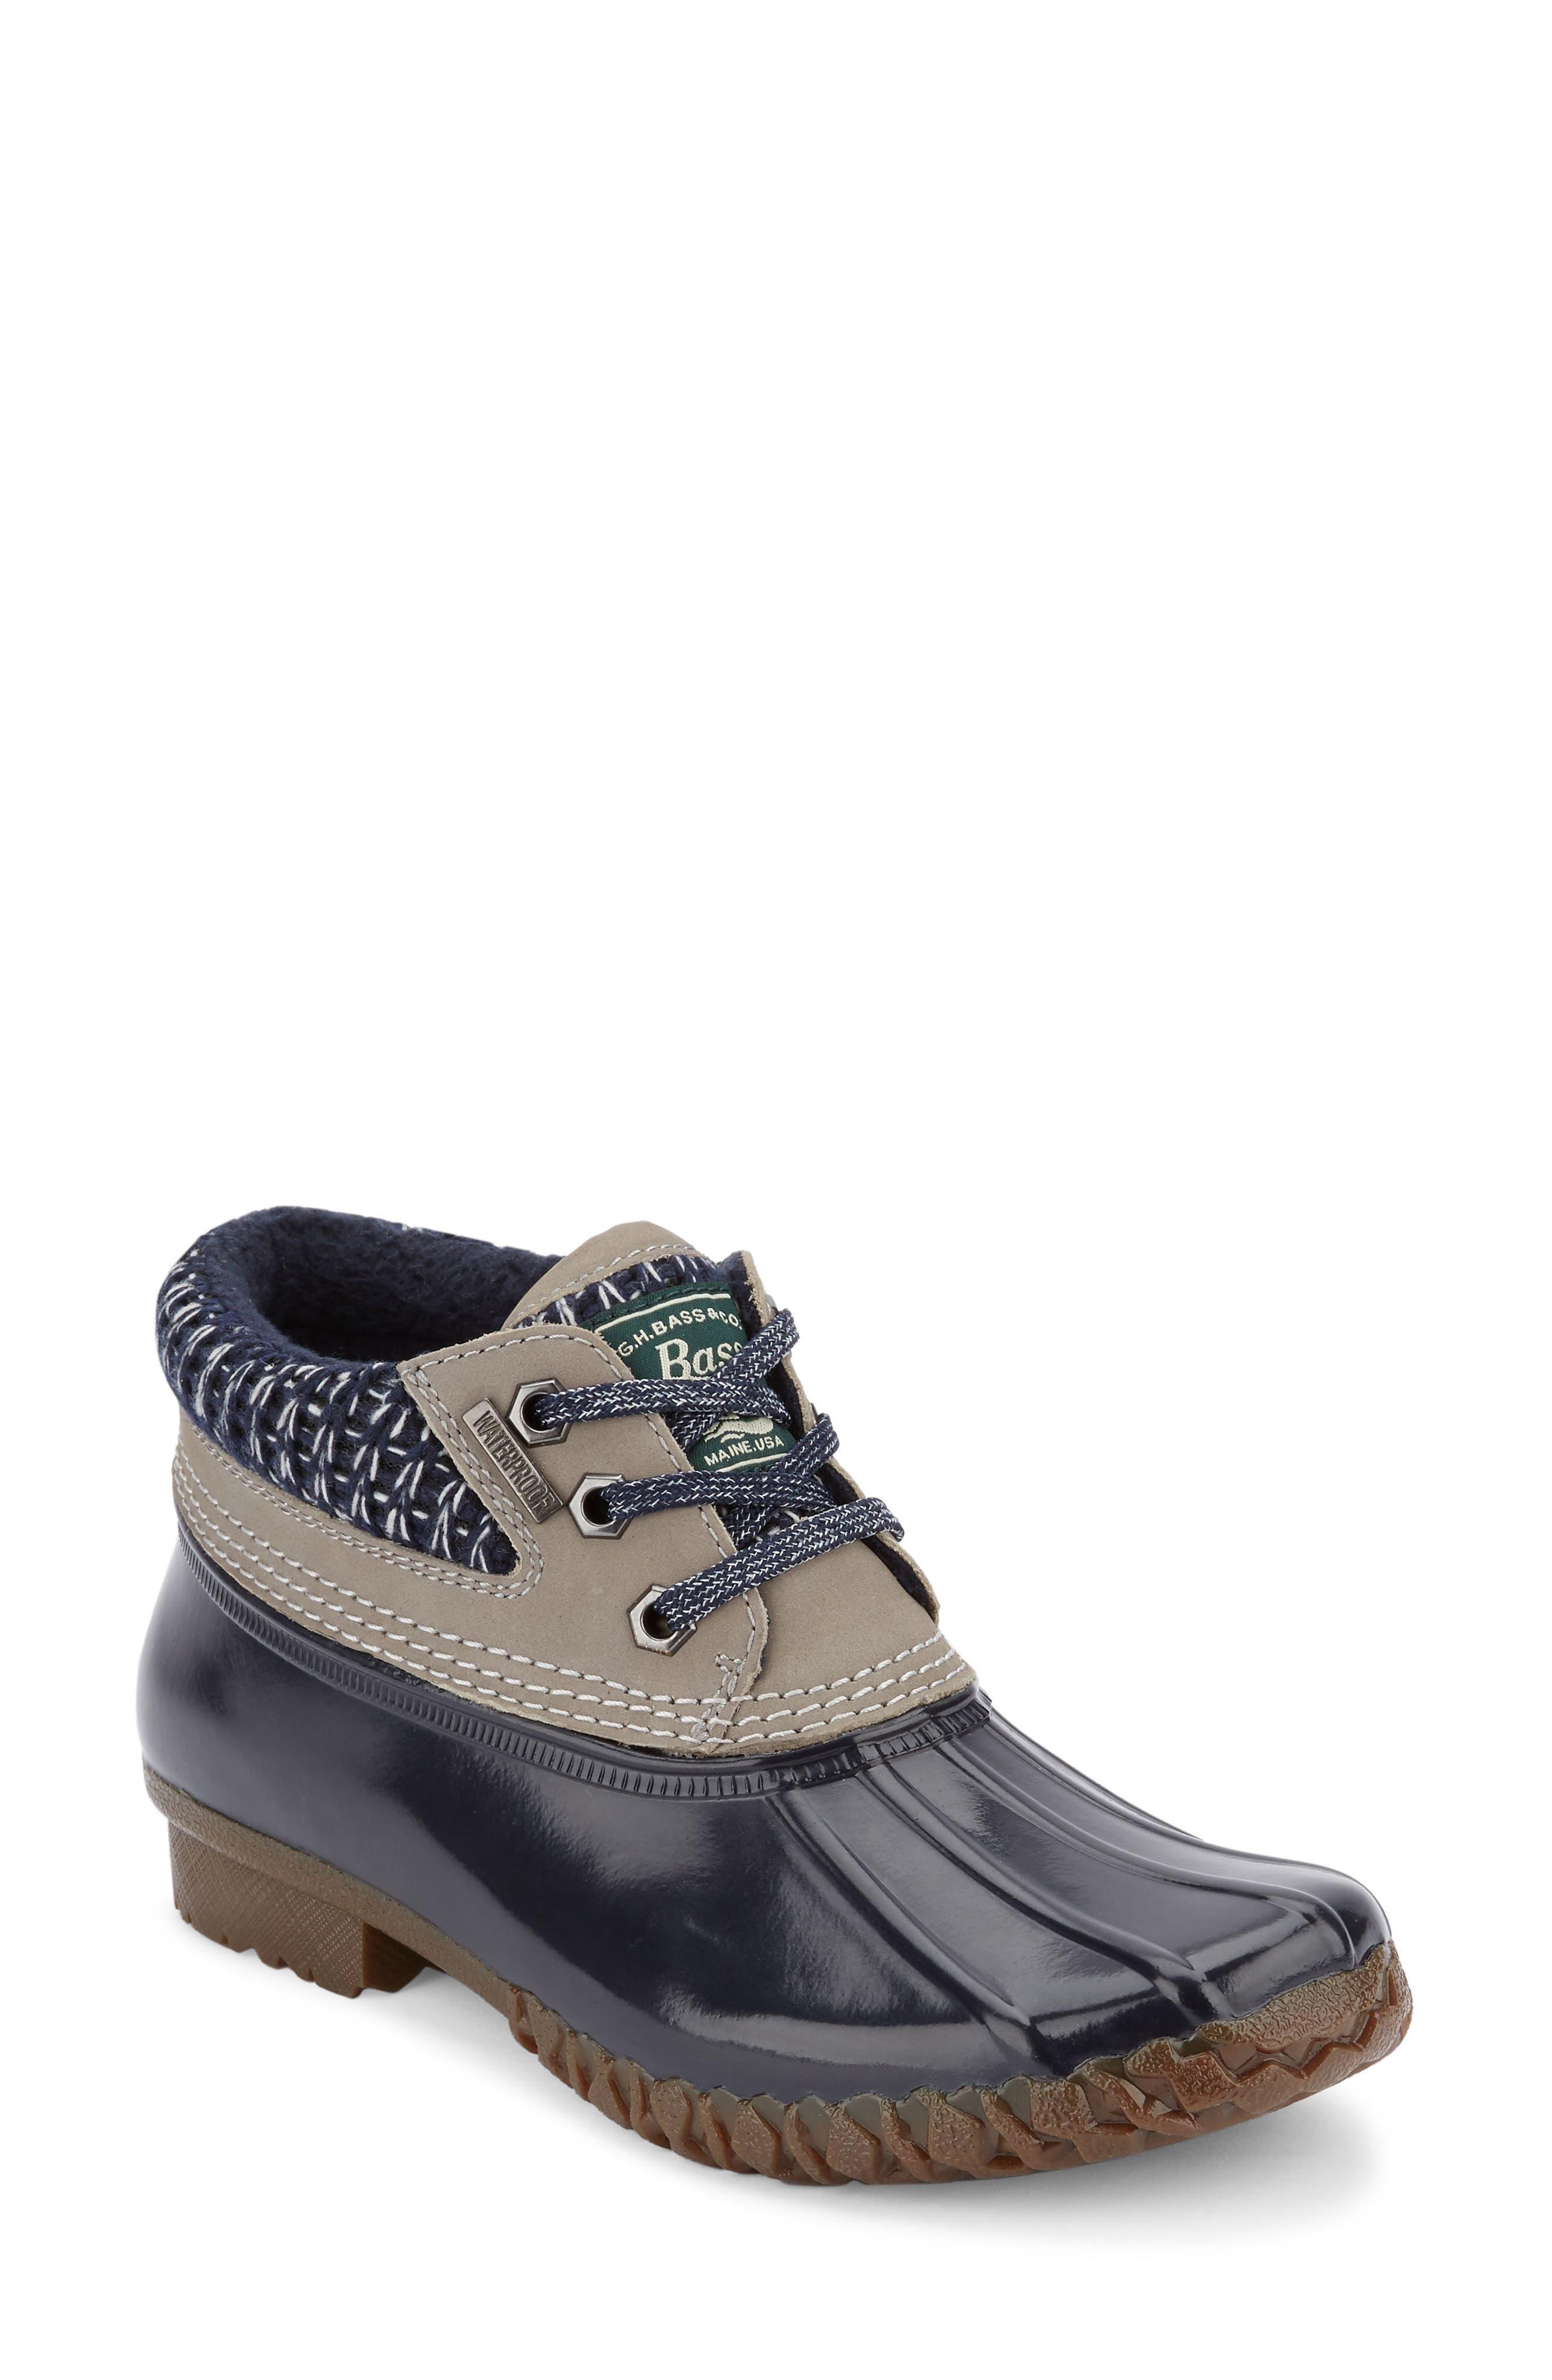 Dorothy Waterproof Duck Boot,                             Main thumbnail 1, color,                             Grey/ Navy